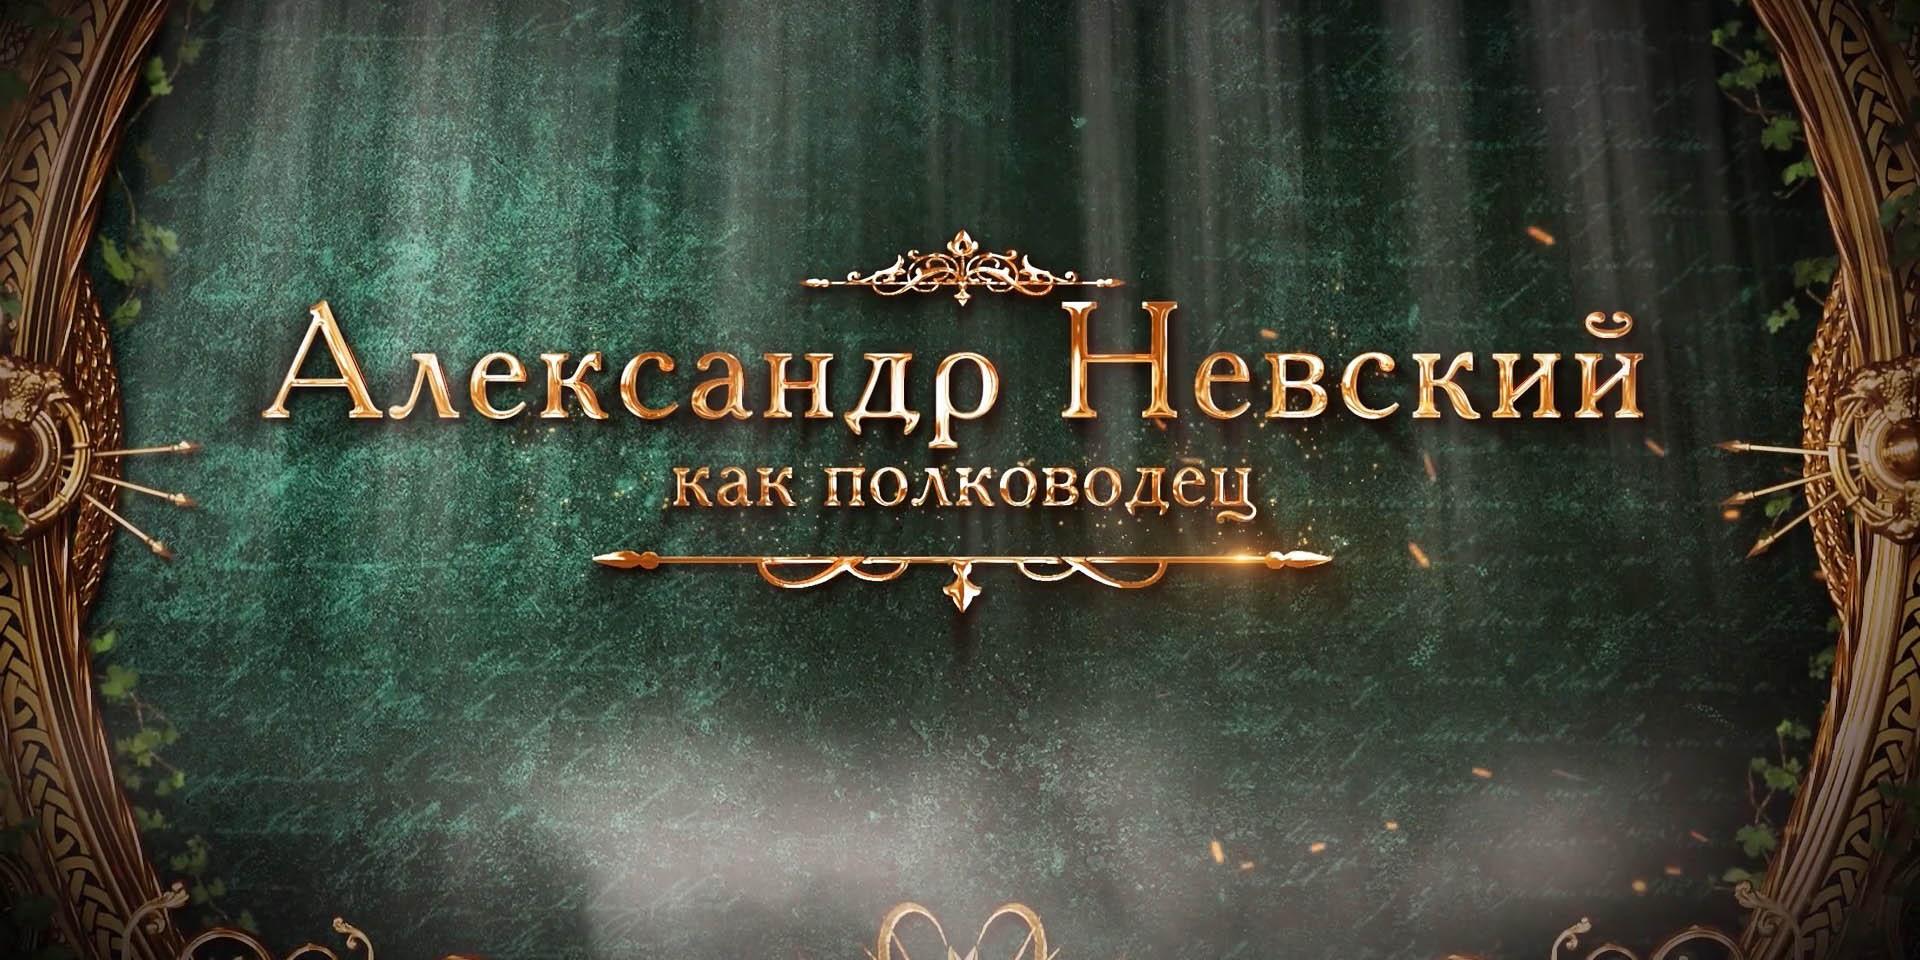 А.А. Кузнецов и Д.В. Семикопов «Александр Невский как полководец»